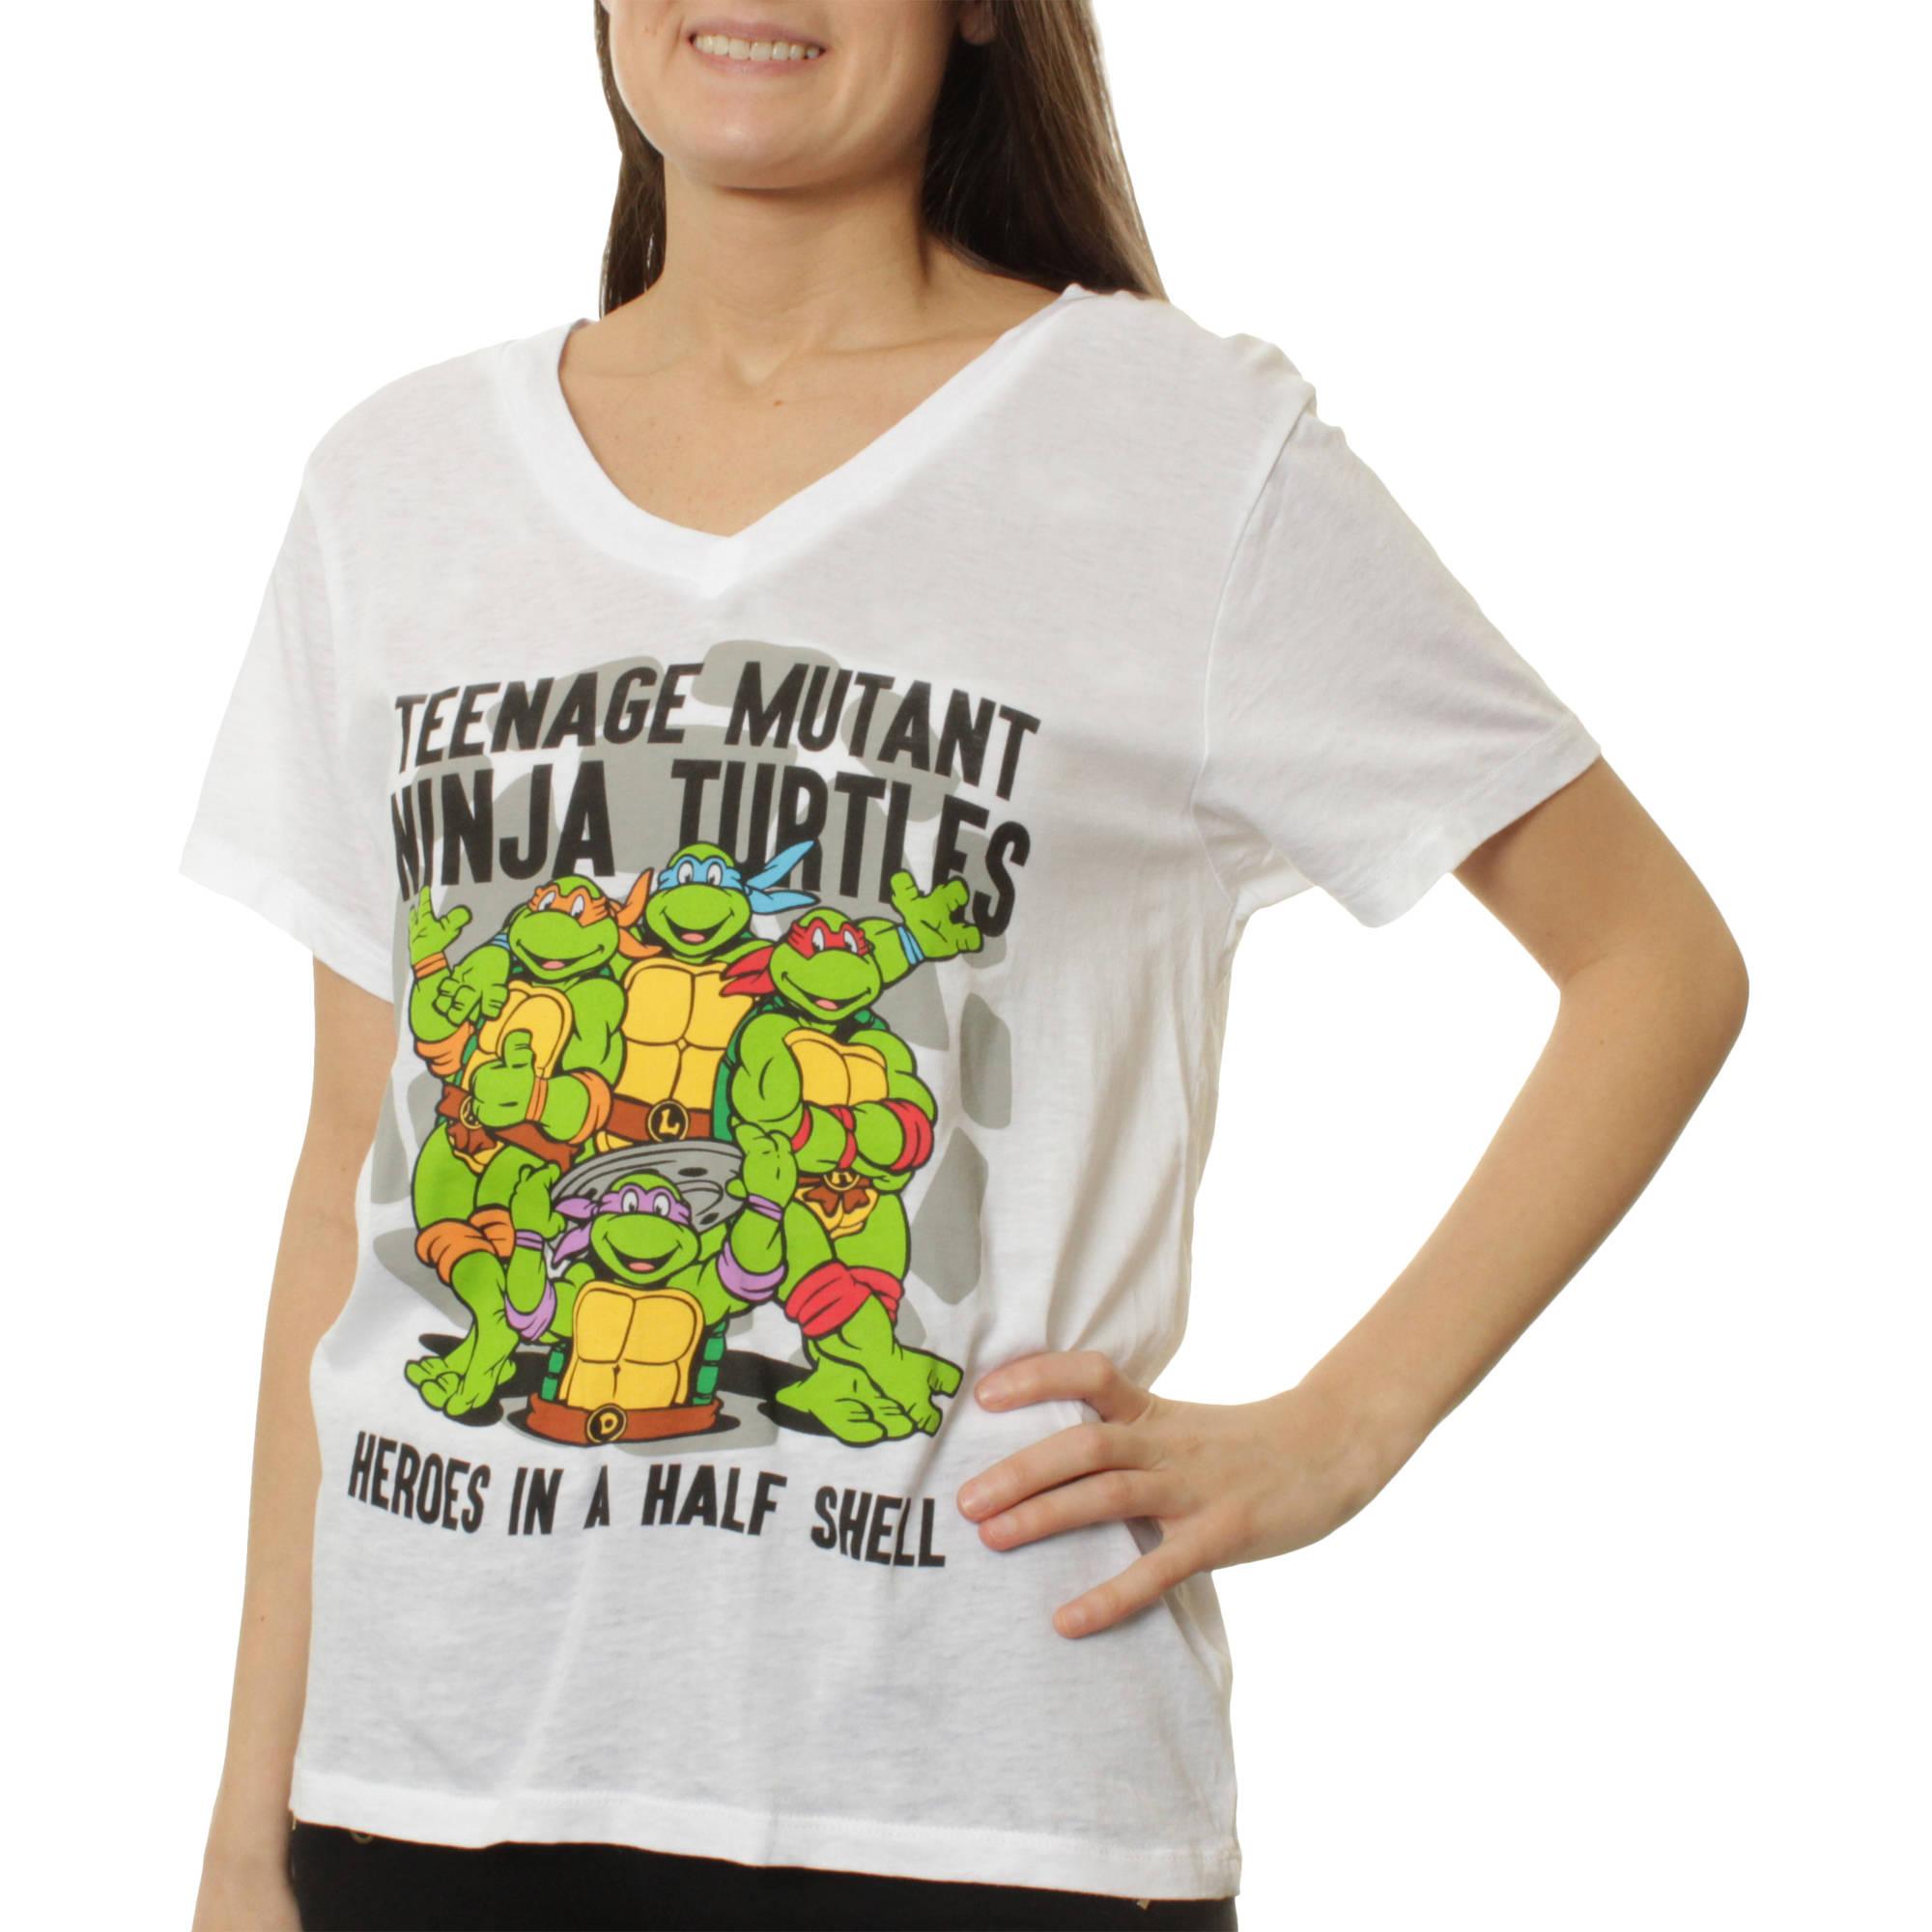 Womens Burnout Graphic T-Shirt